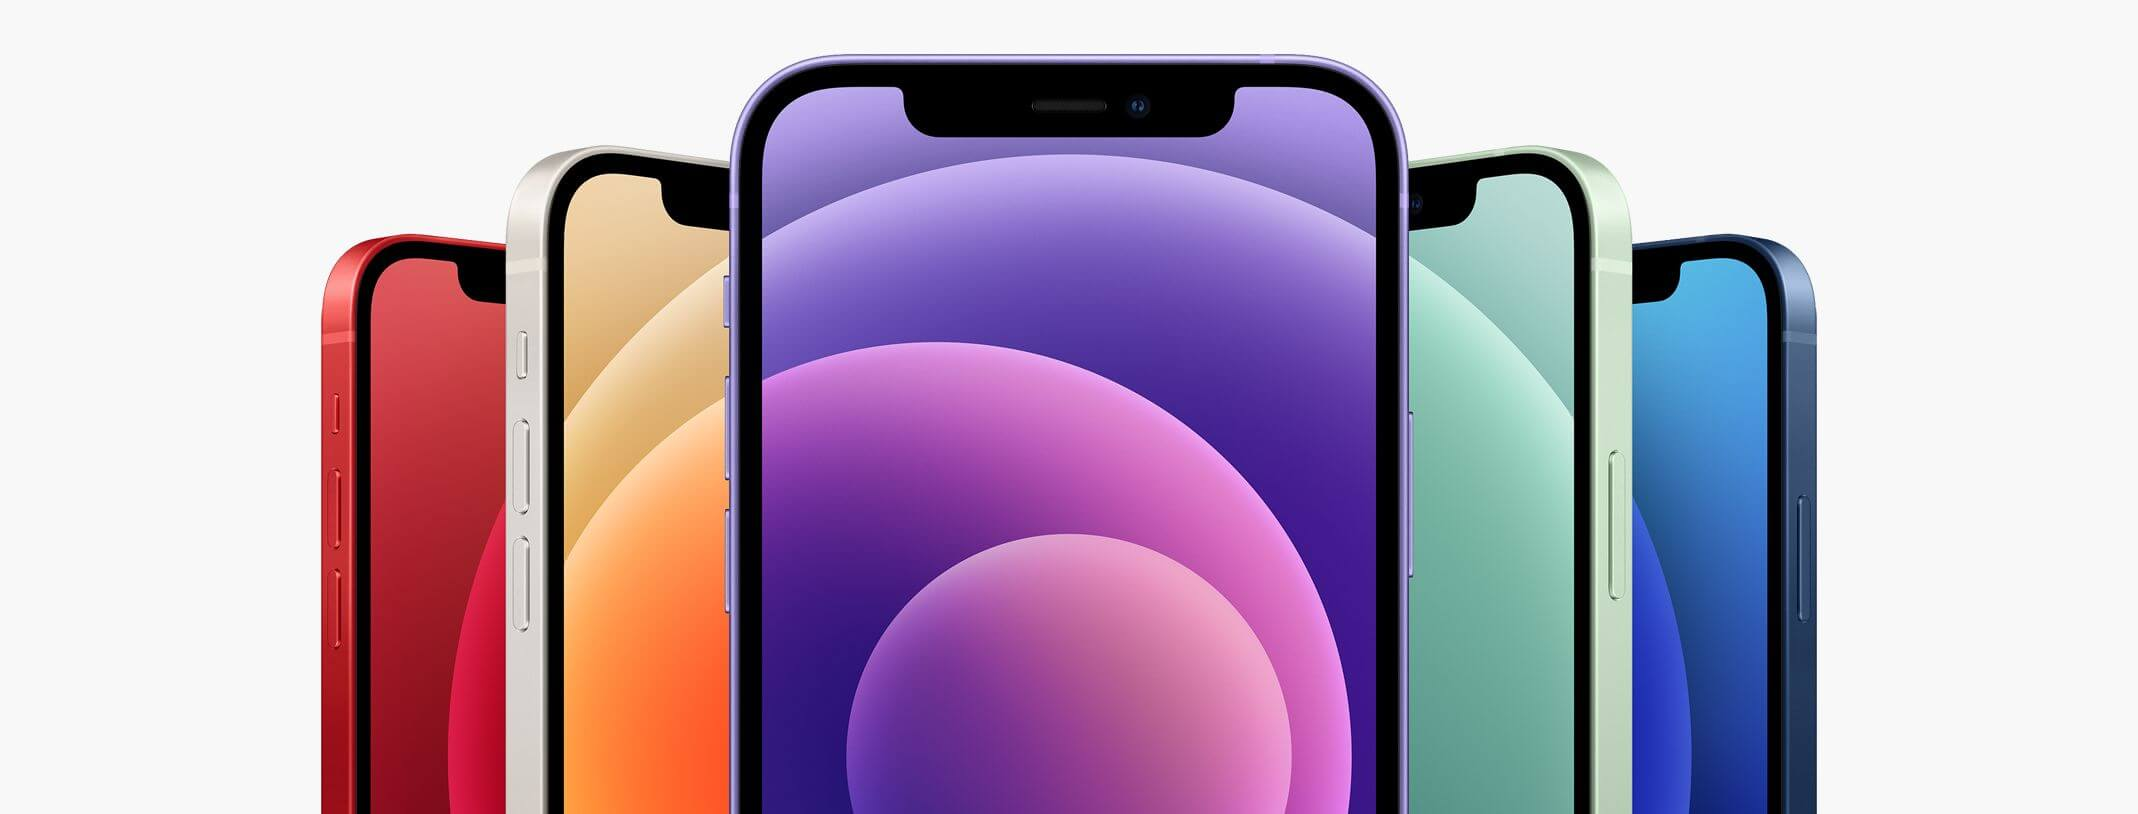 iphone-12-gallery2-2021